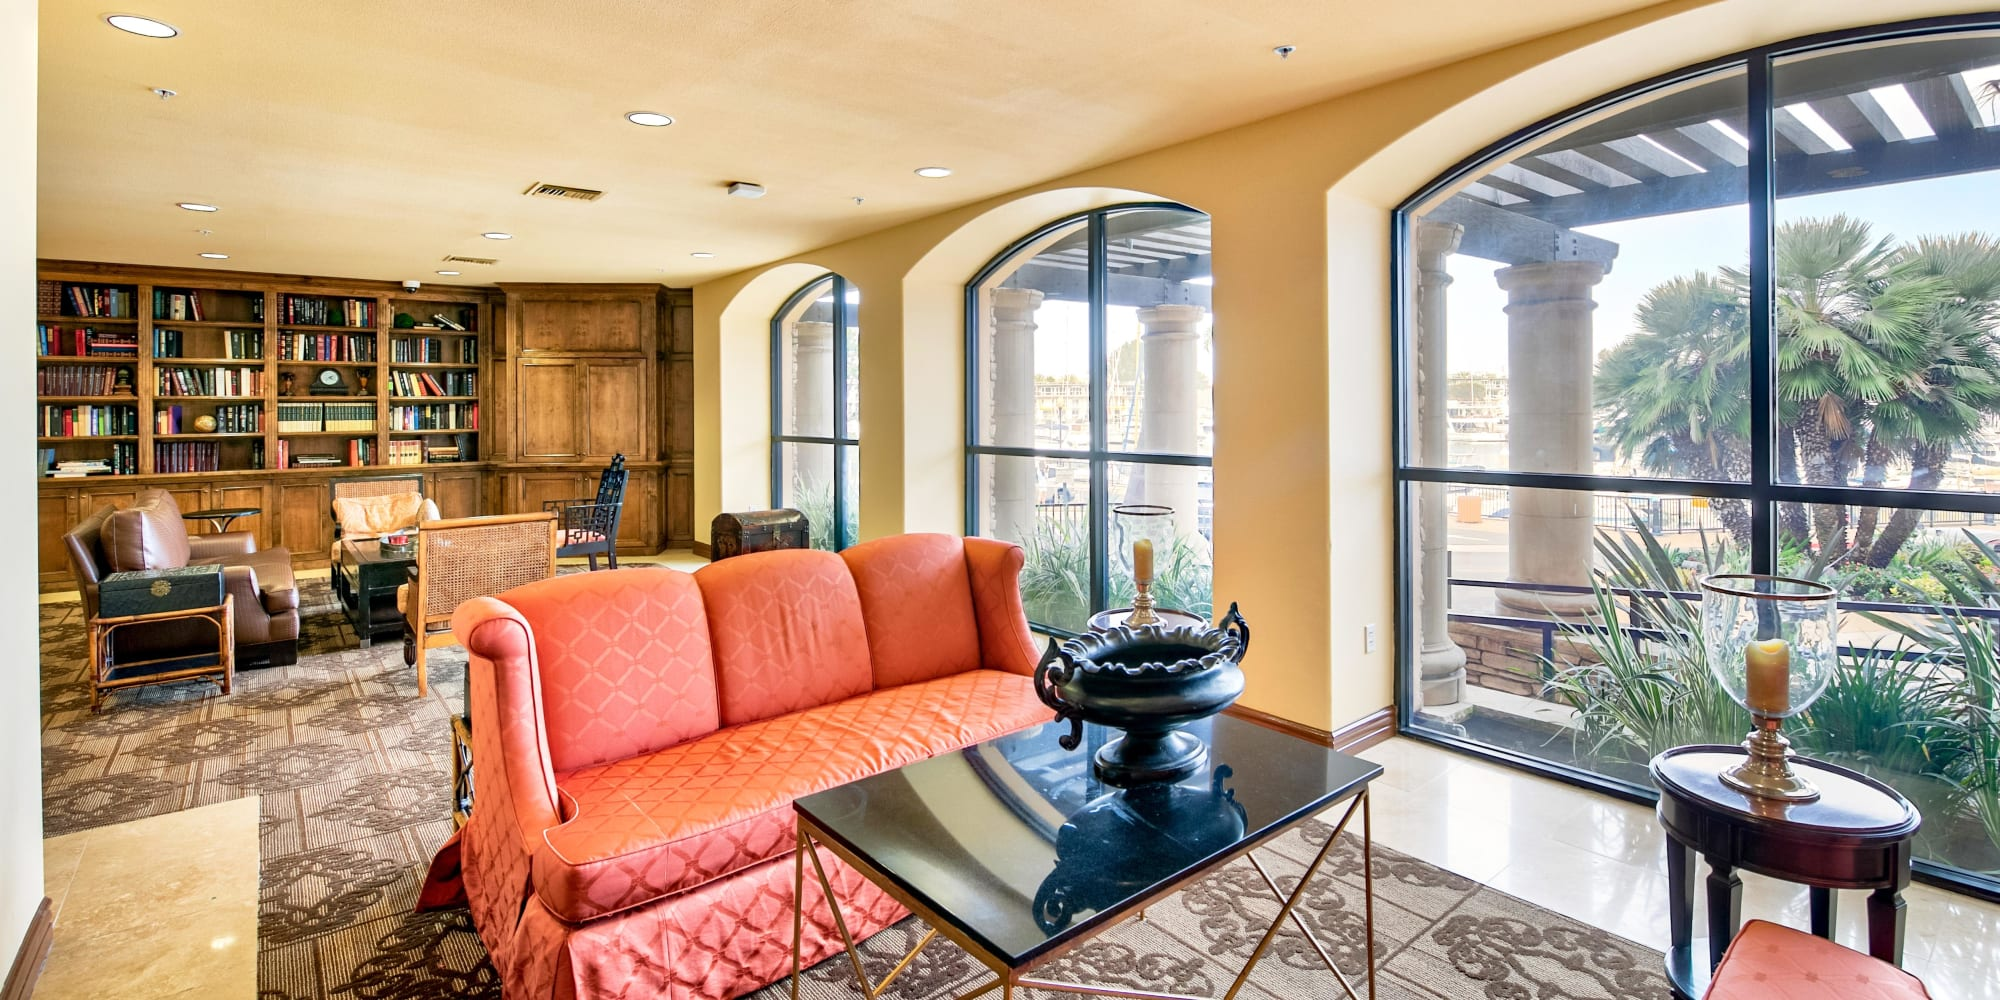 Clubhouse lounge area at The Villa at Marina Harbor in Marina del Rey, California